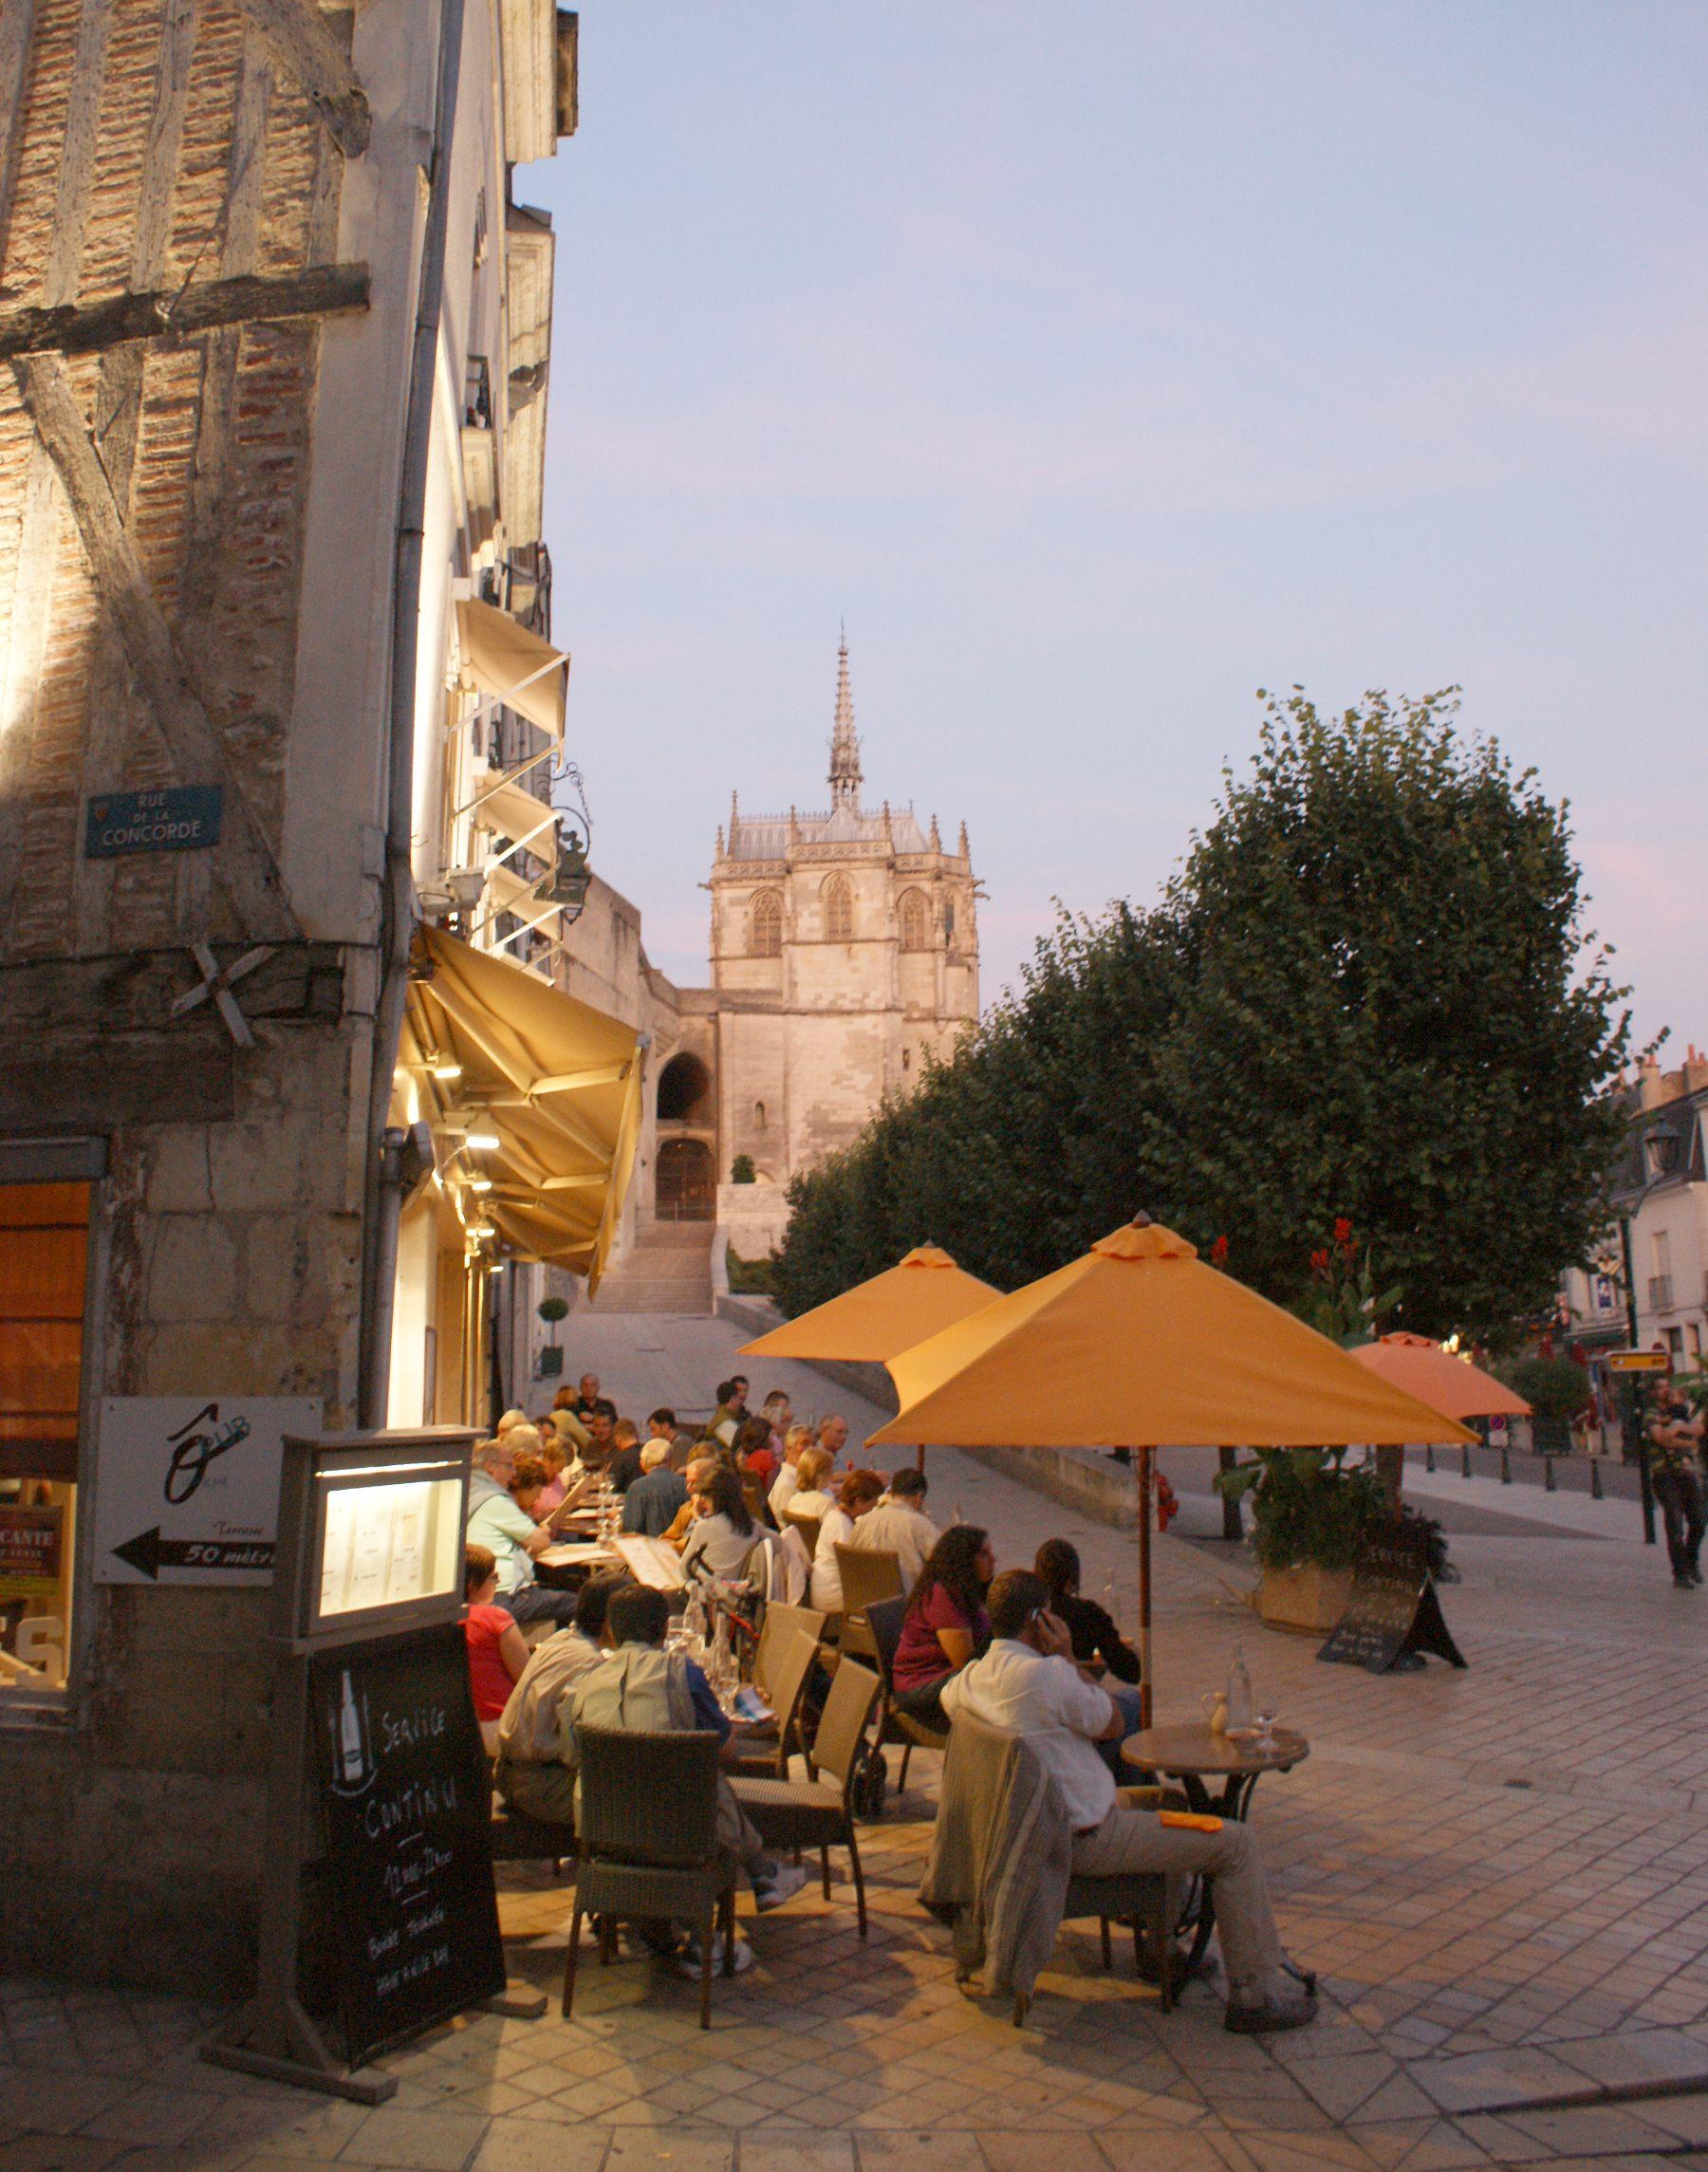 The Amboise Square